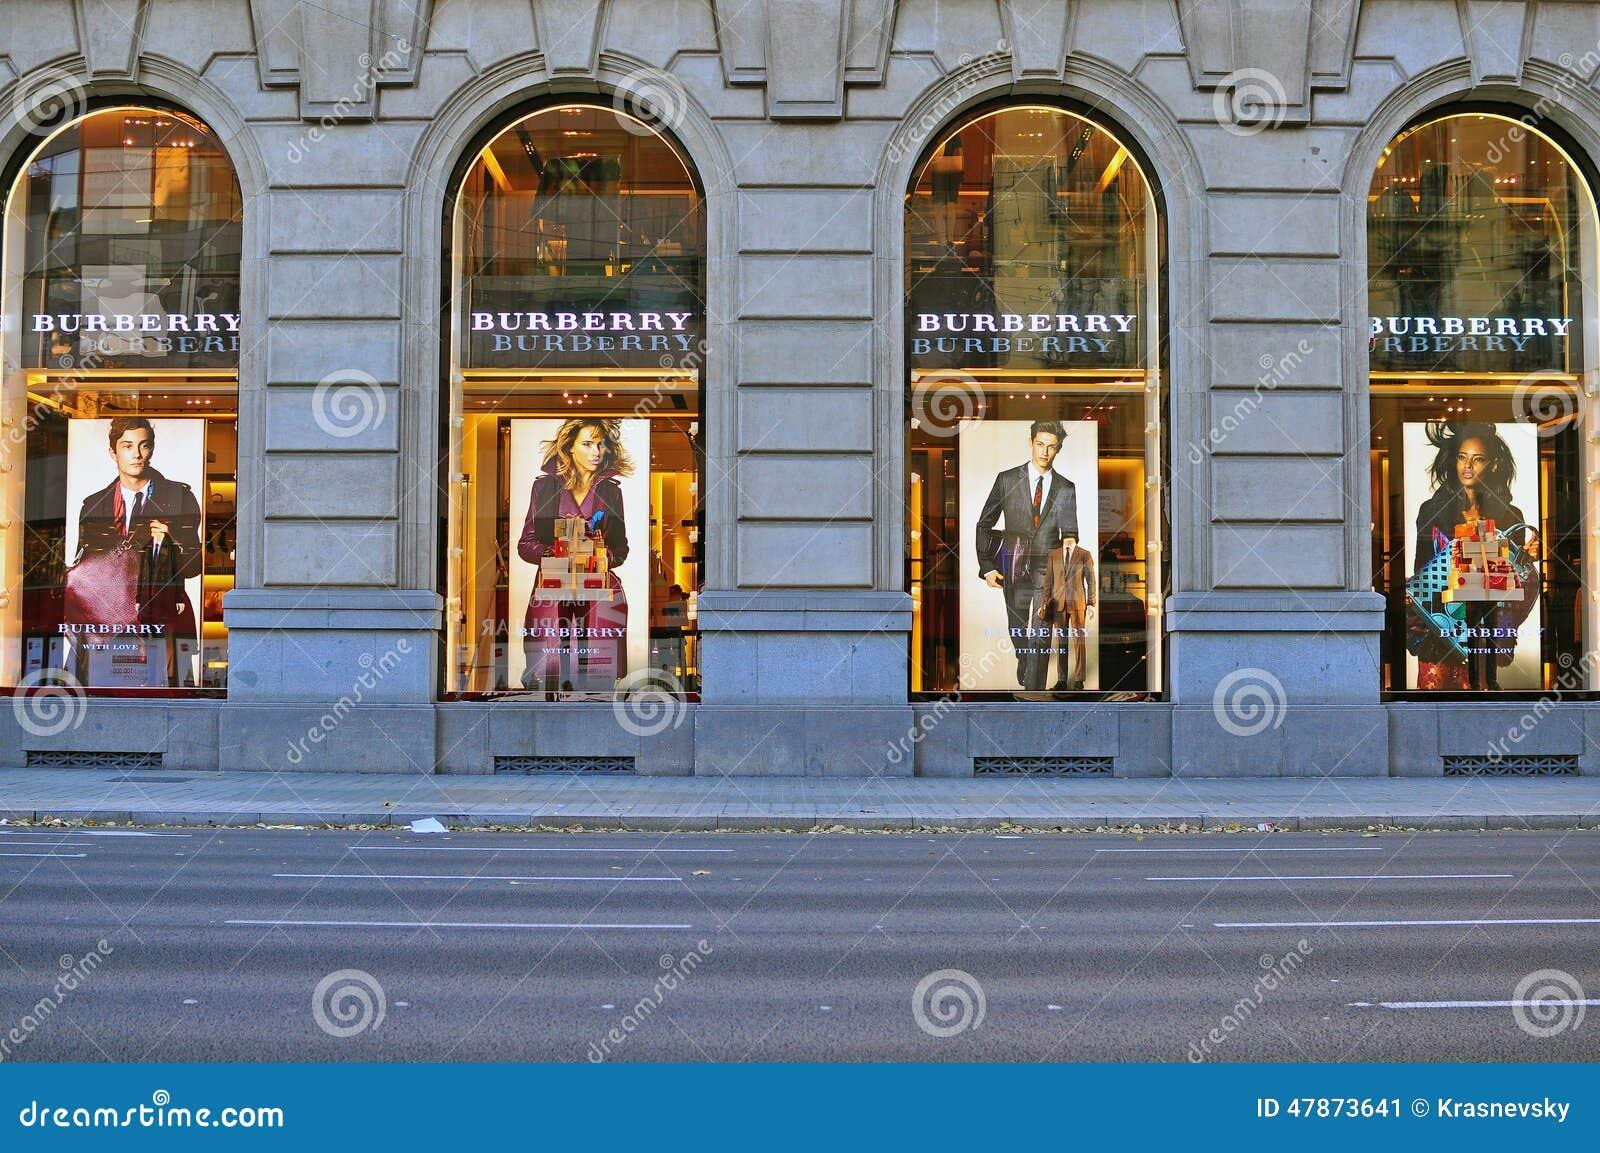 Department Stores / Malls